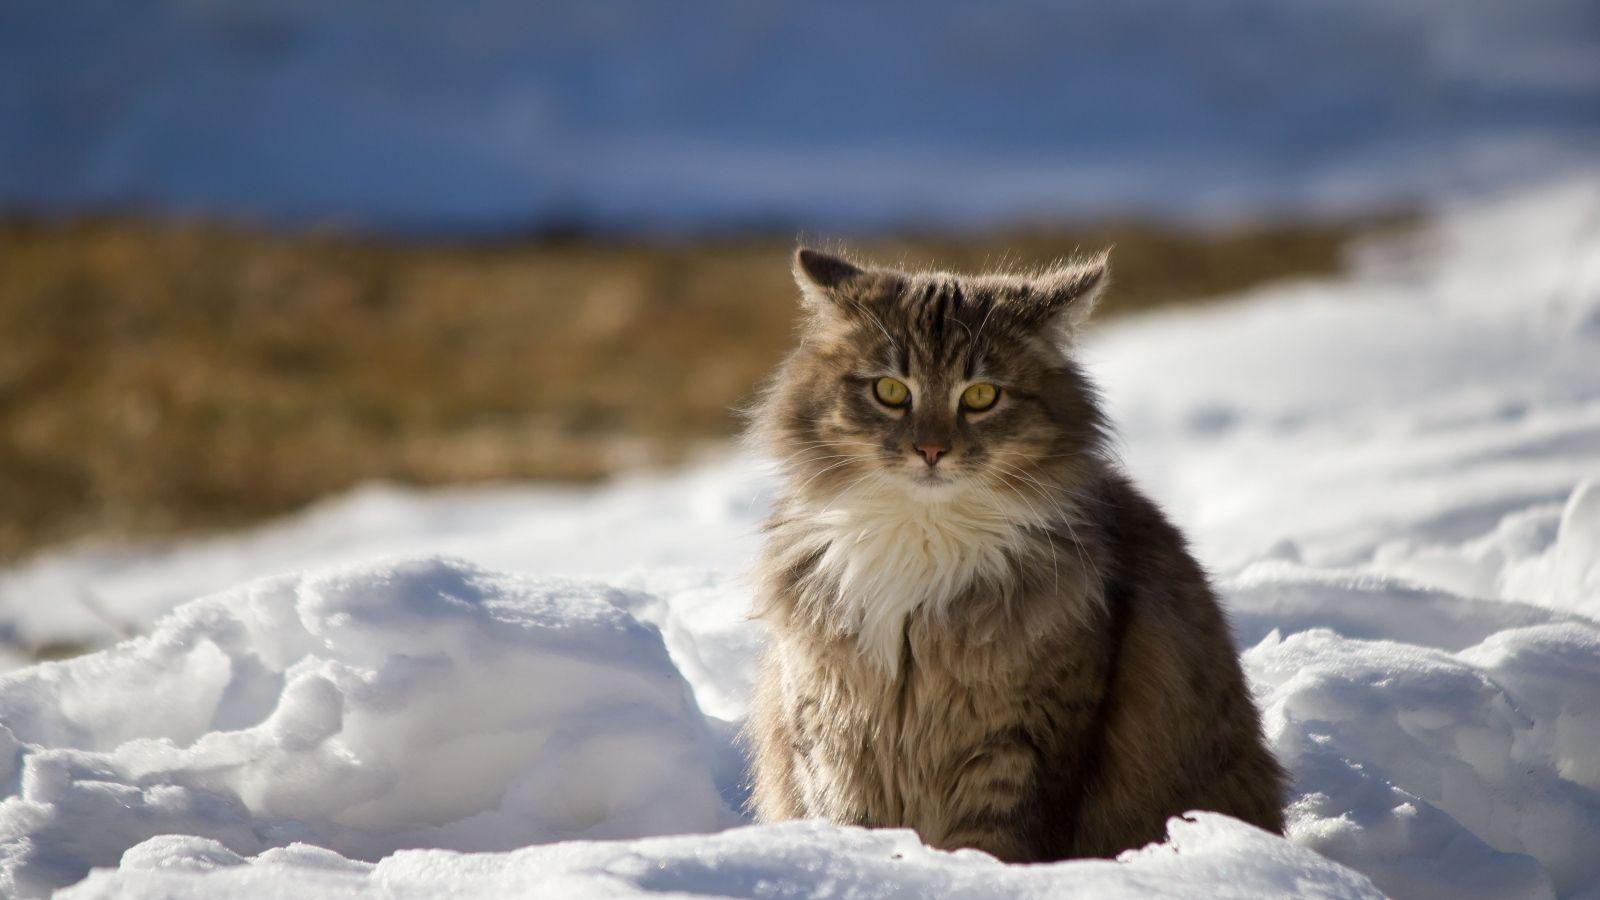 Download Wallpaper 1600x900 Cat, Winter, Fluffy, Snow